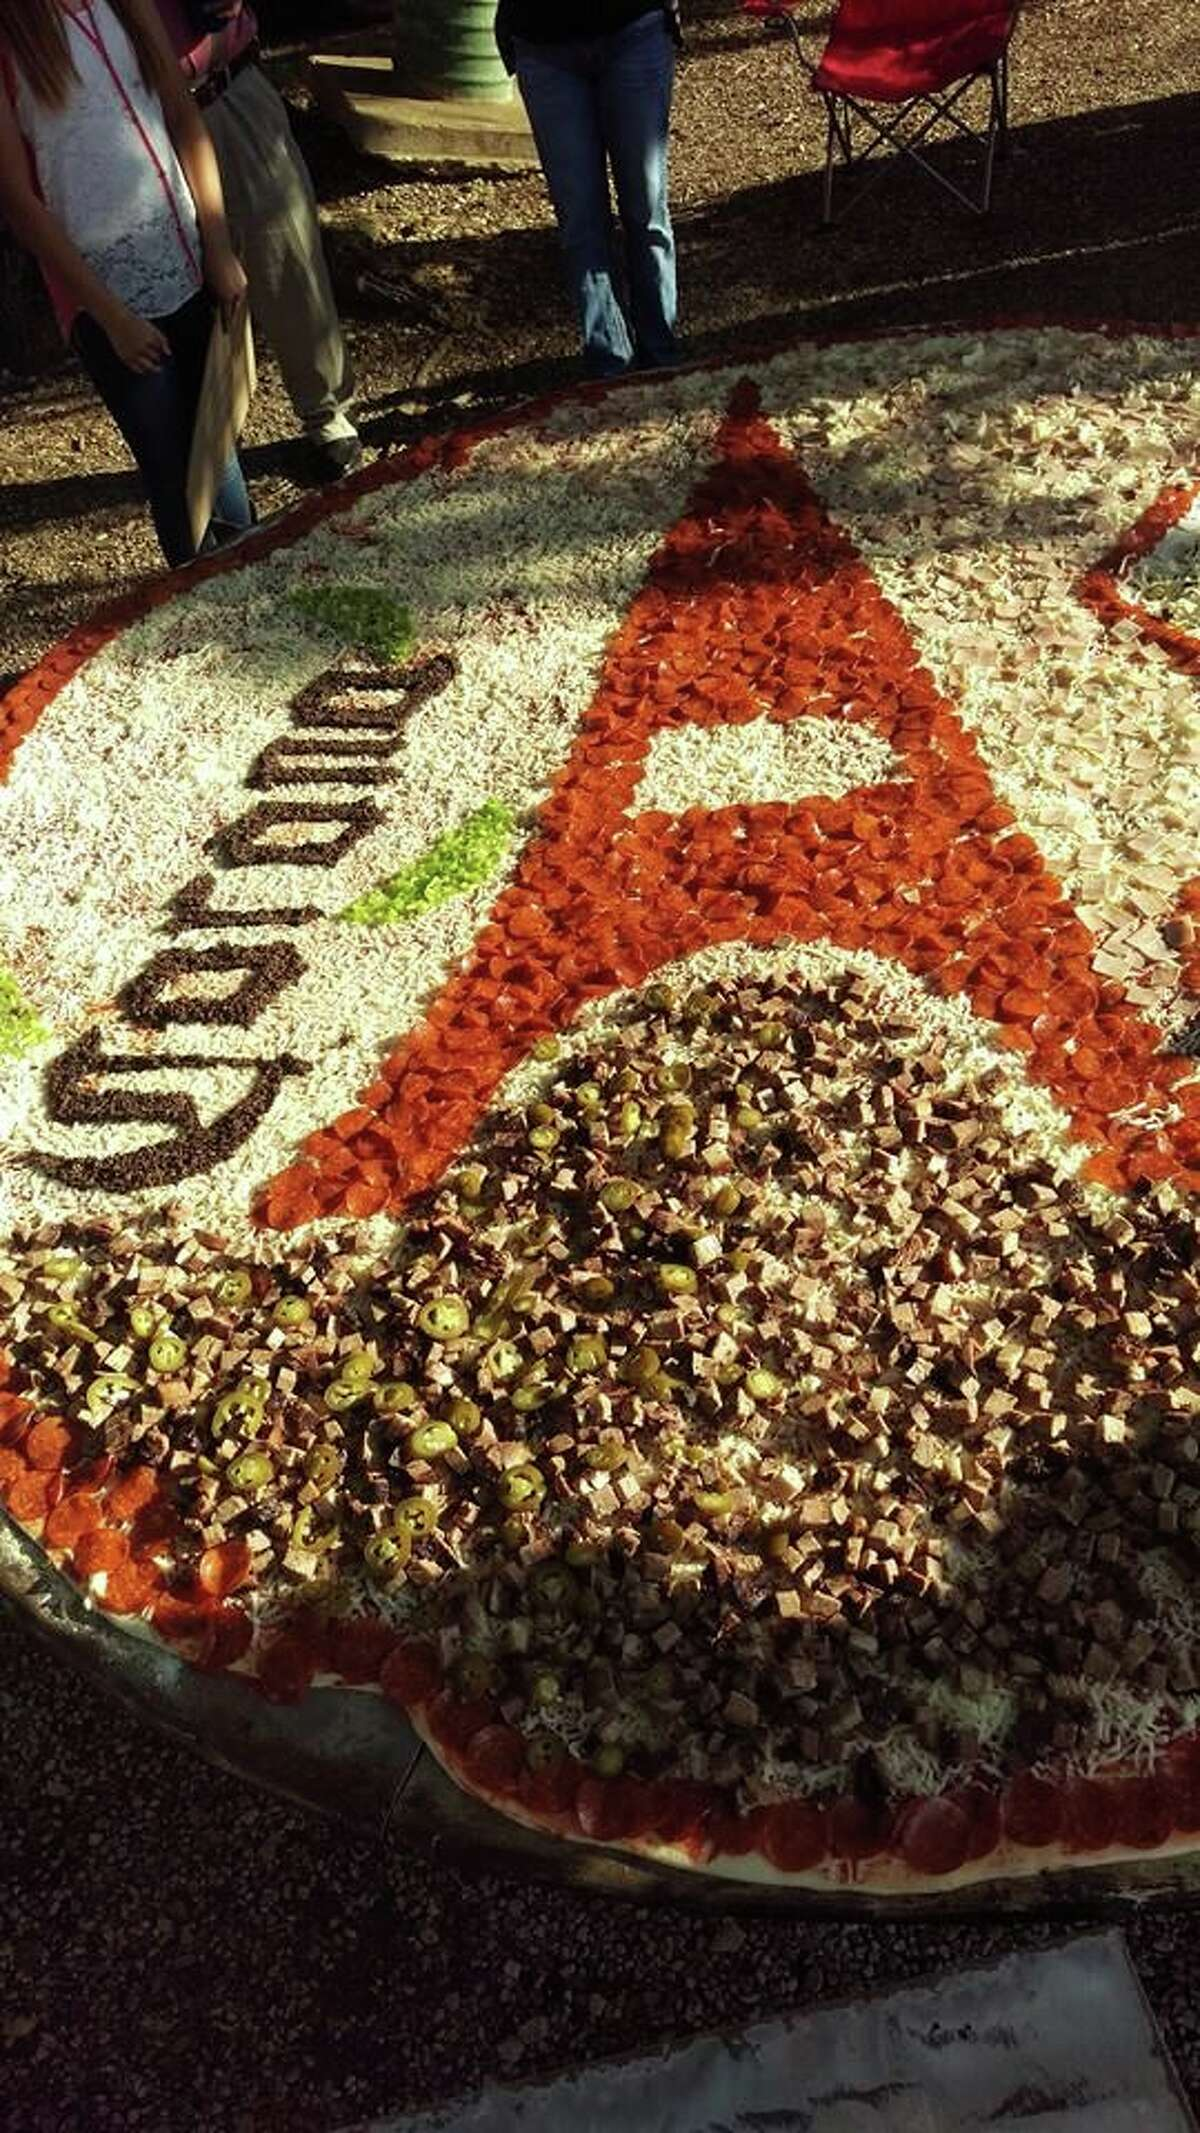 Kurt Oefinger, owner of Hondo-based Dirt Road Cookers, makes gigantic pizzas which measure 8 feet in diameter.